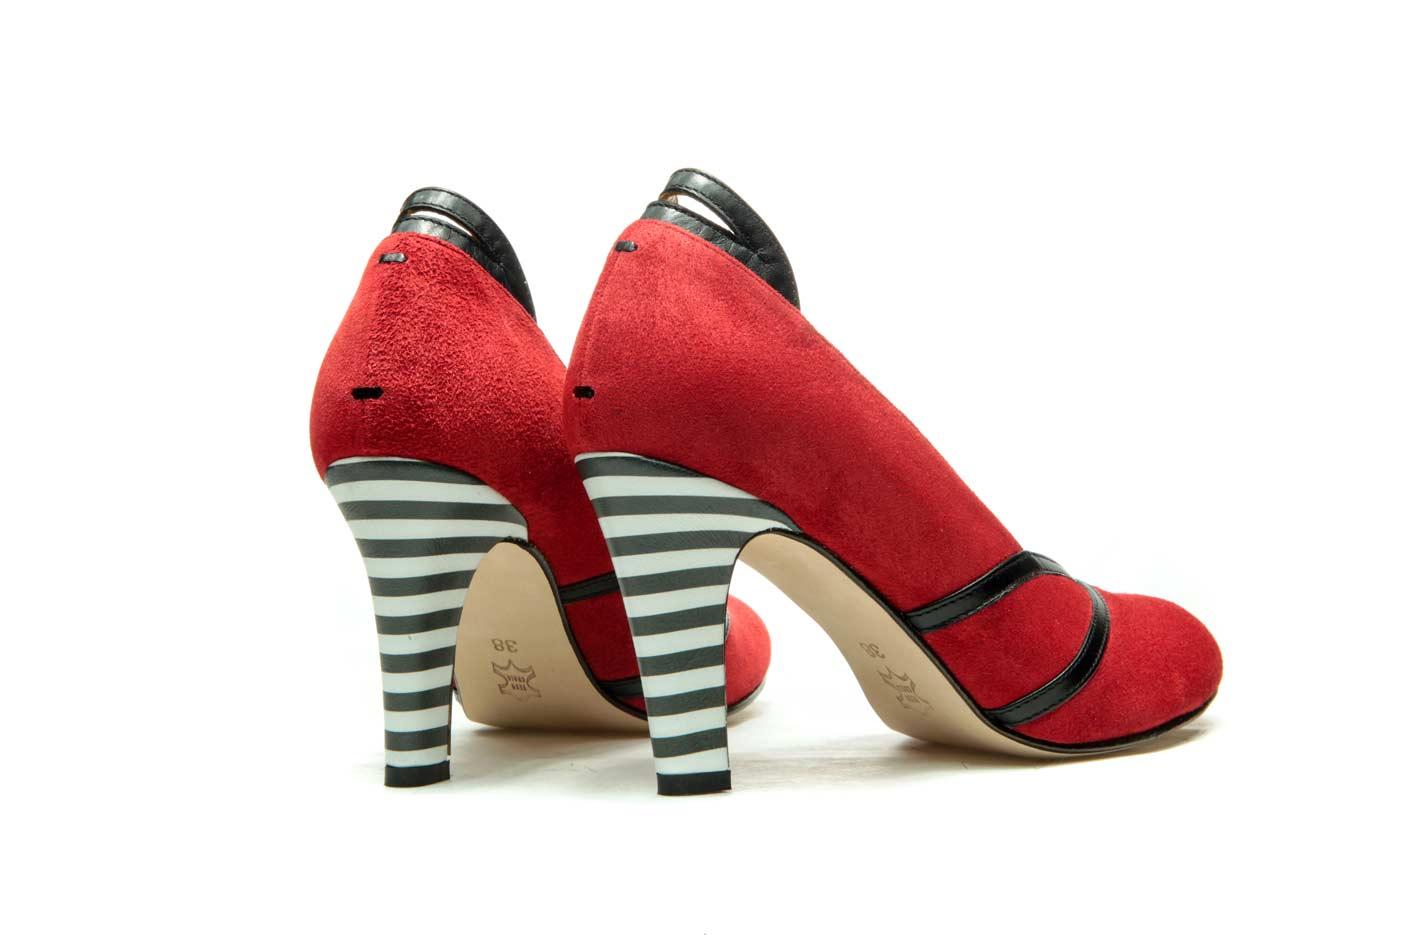 Red Handmade Womens Shoes Striped High Heel Pumps